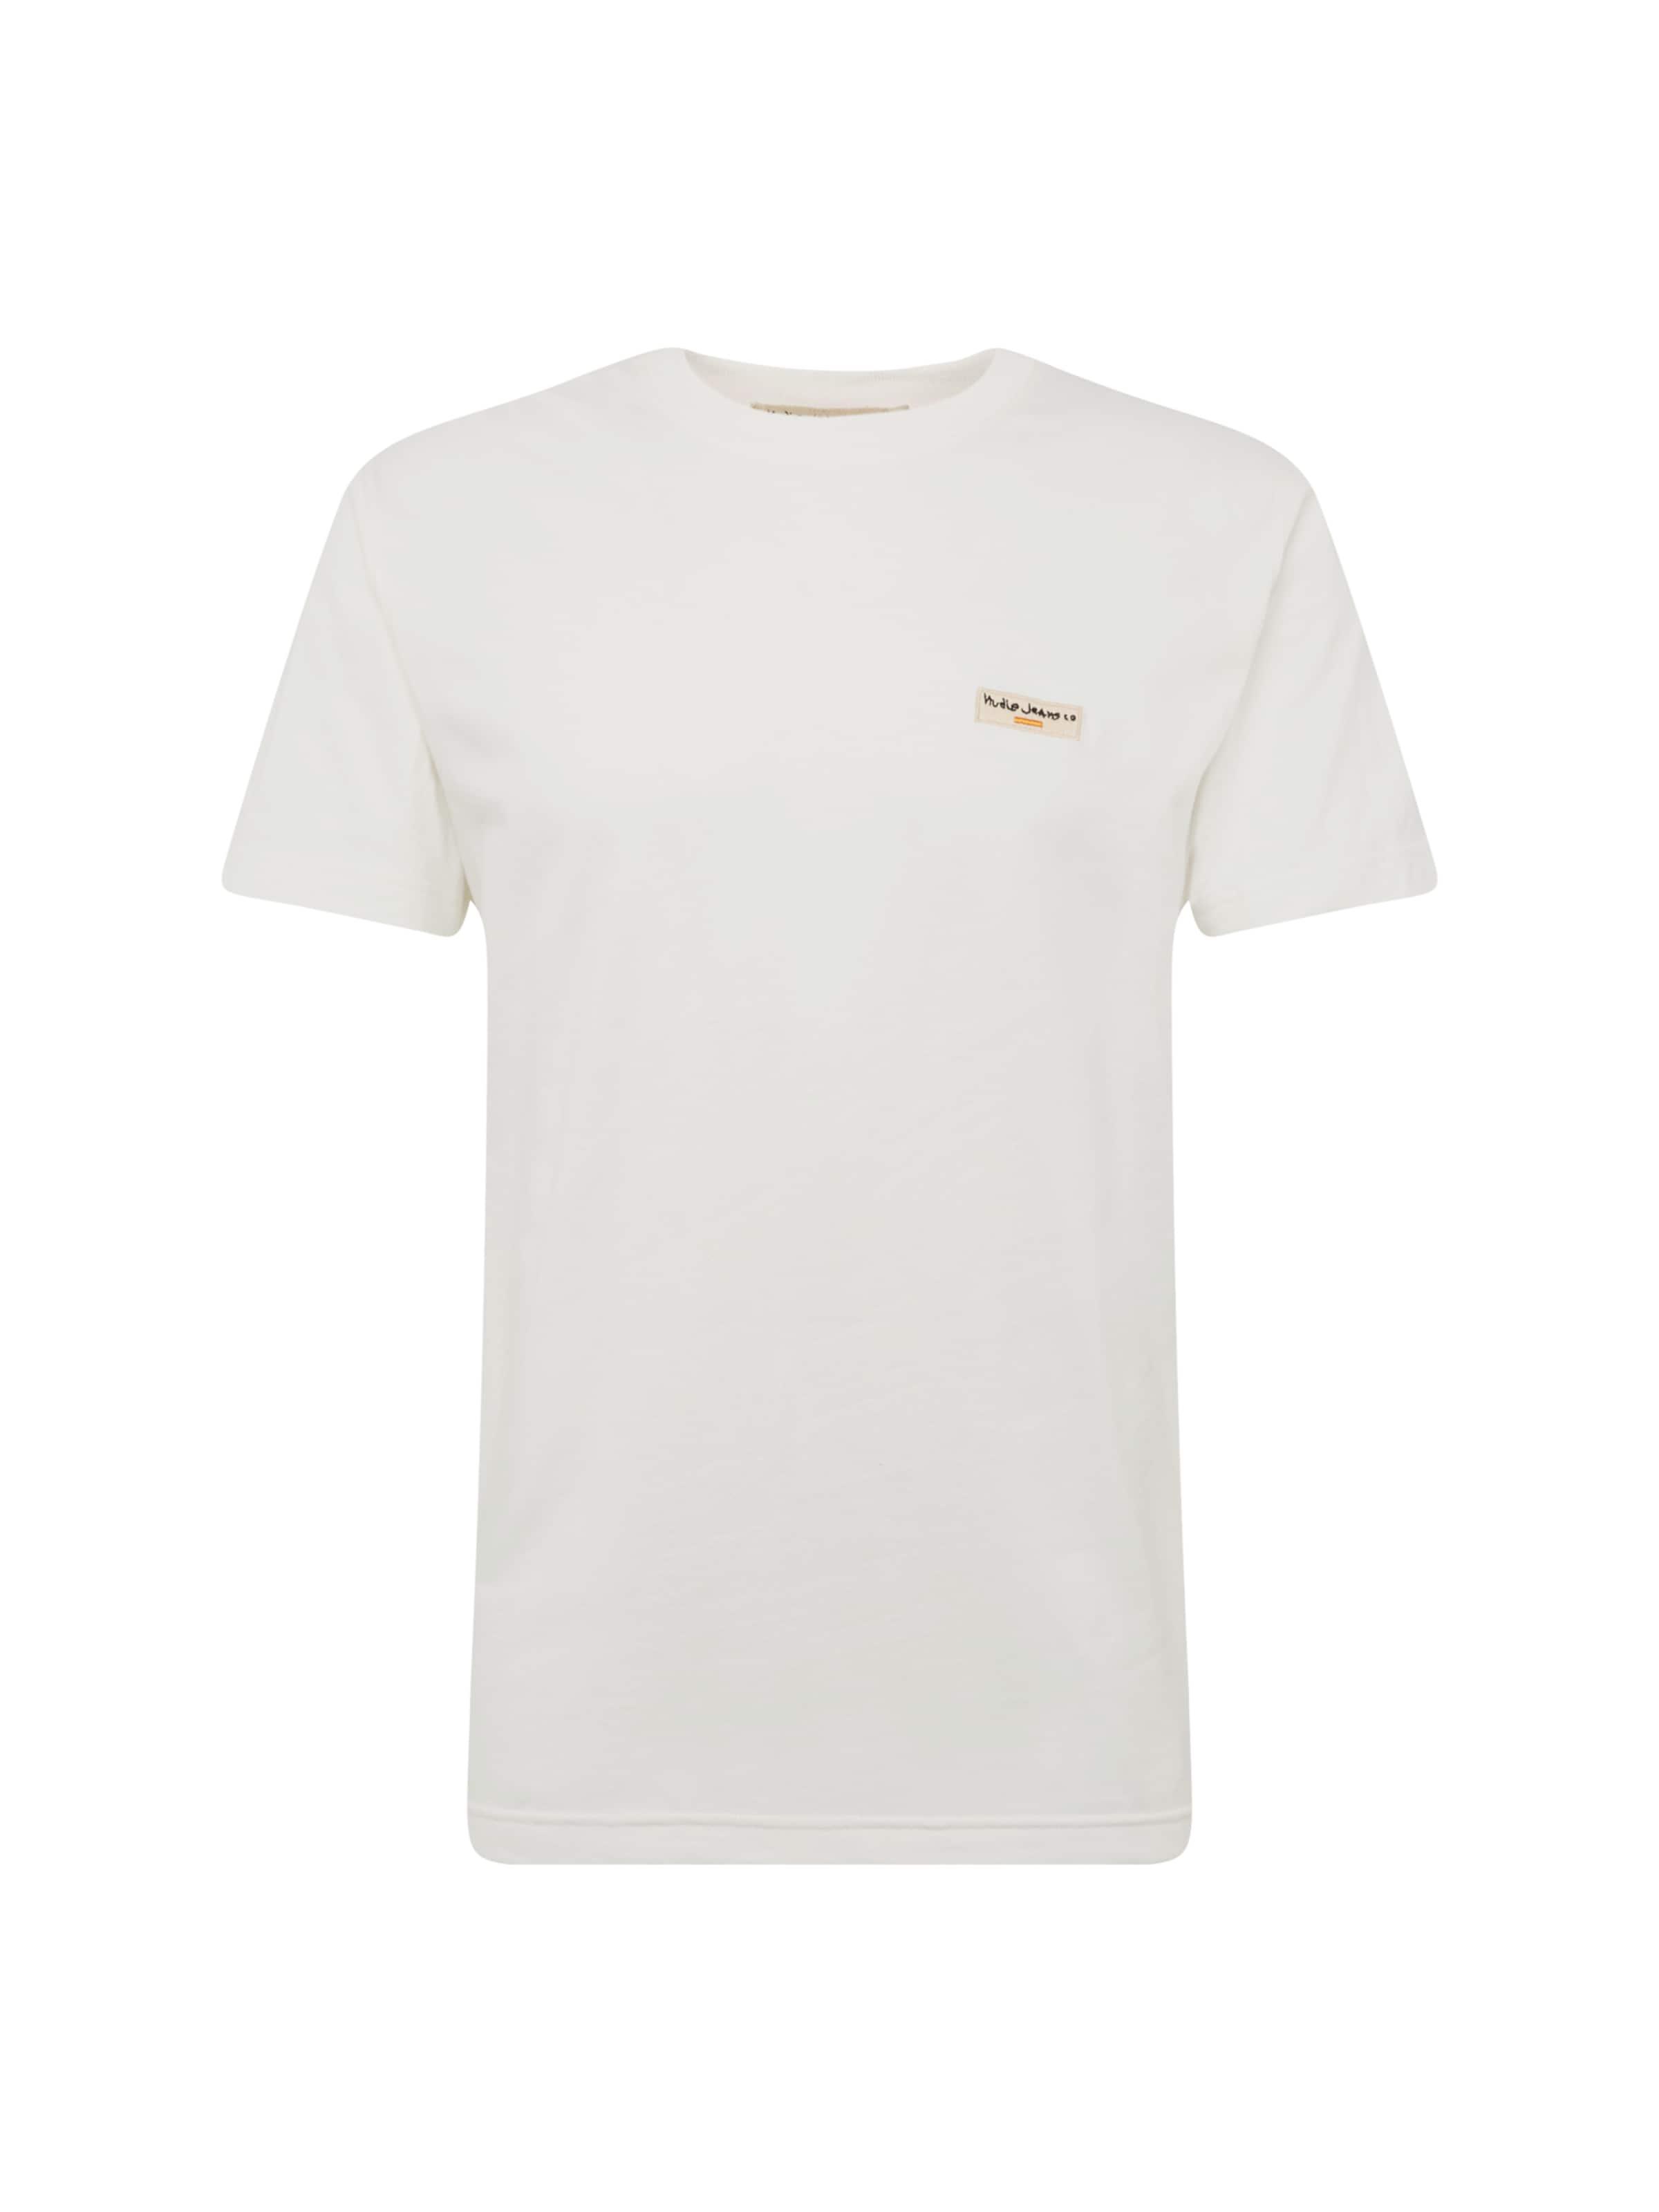 Blanc Jeans 'daniel shirt Cassé En Co Nudie T Logo' 8OPnwk0